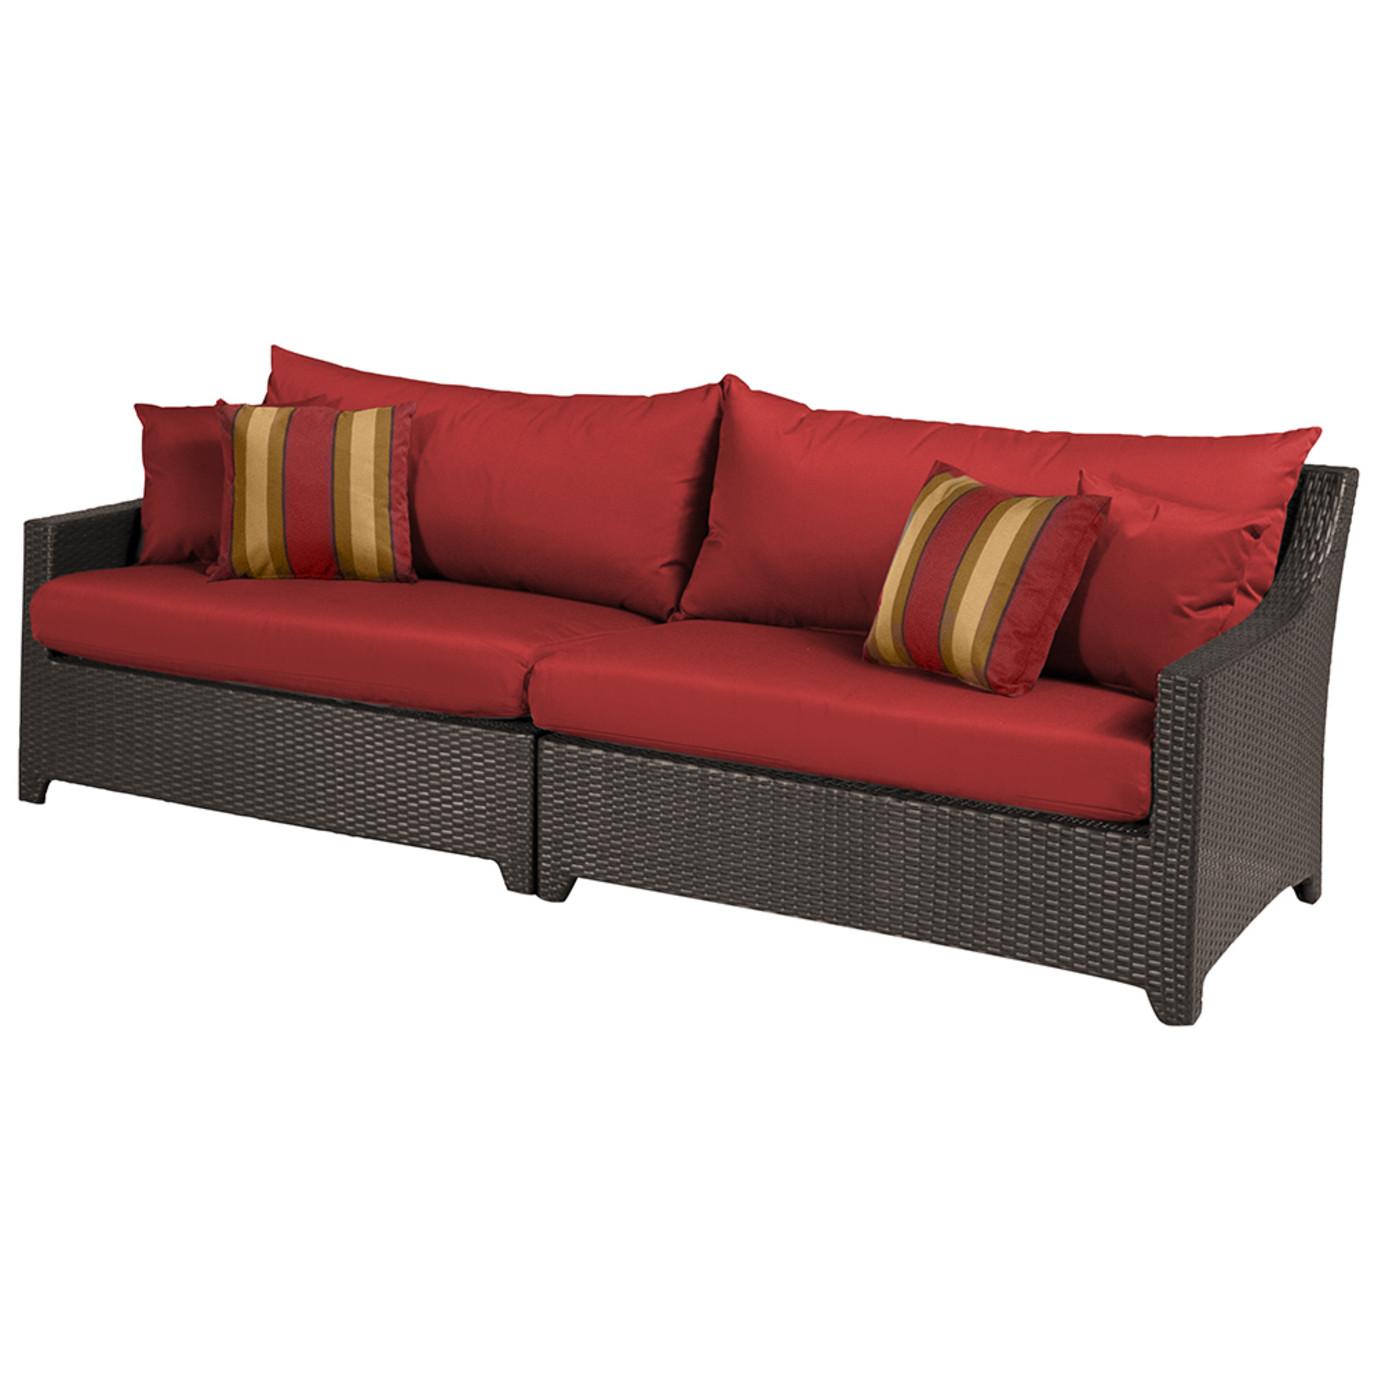 Deco Sofa - Cantina Red